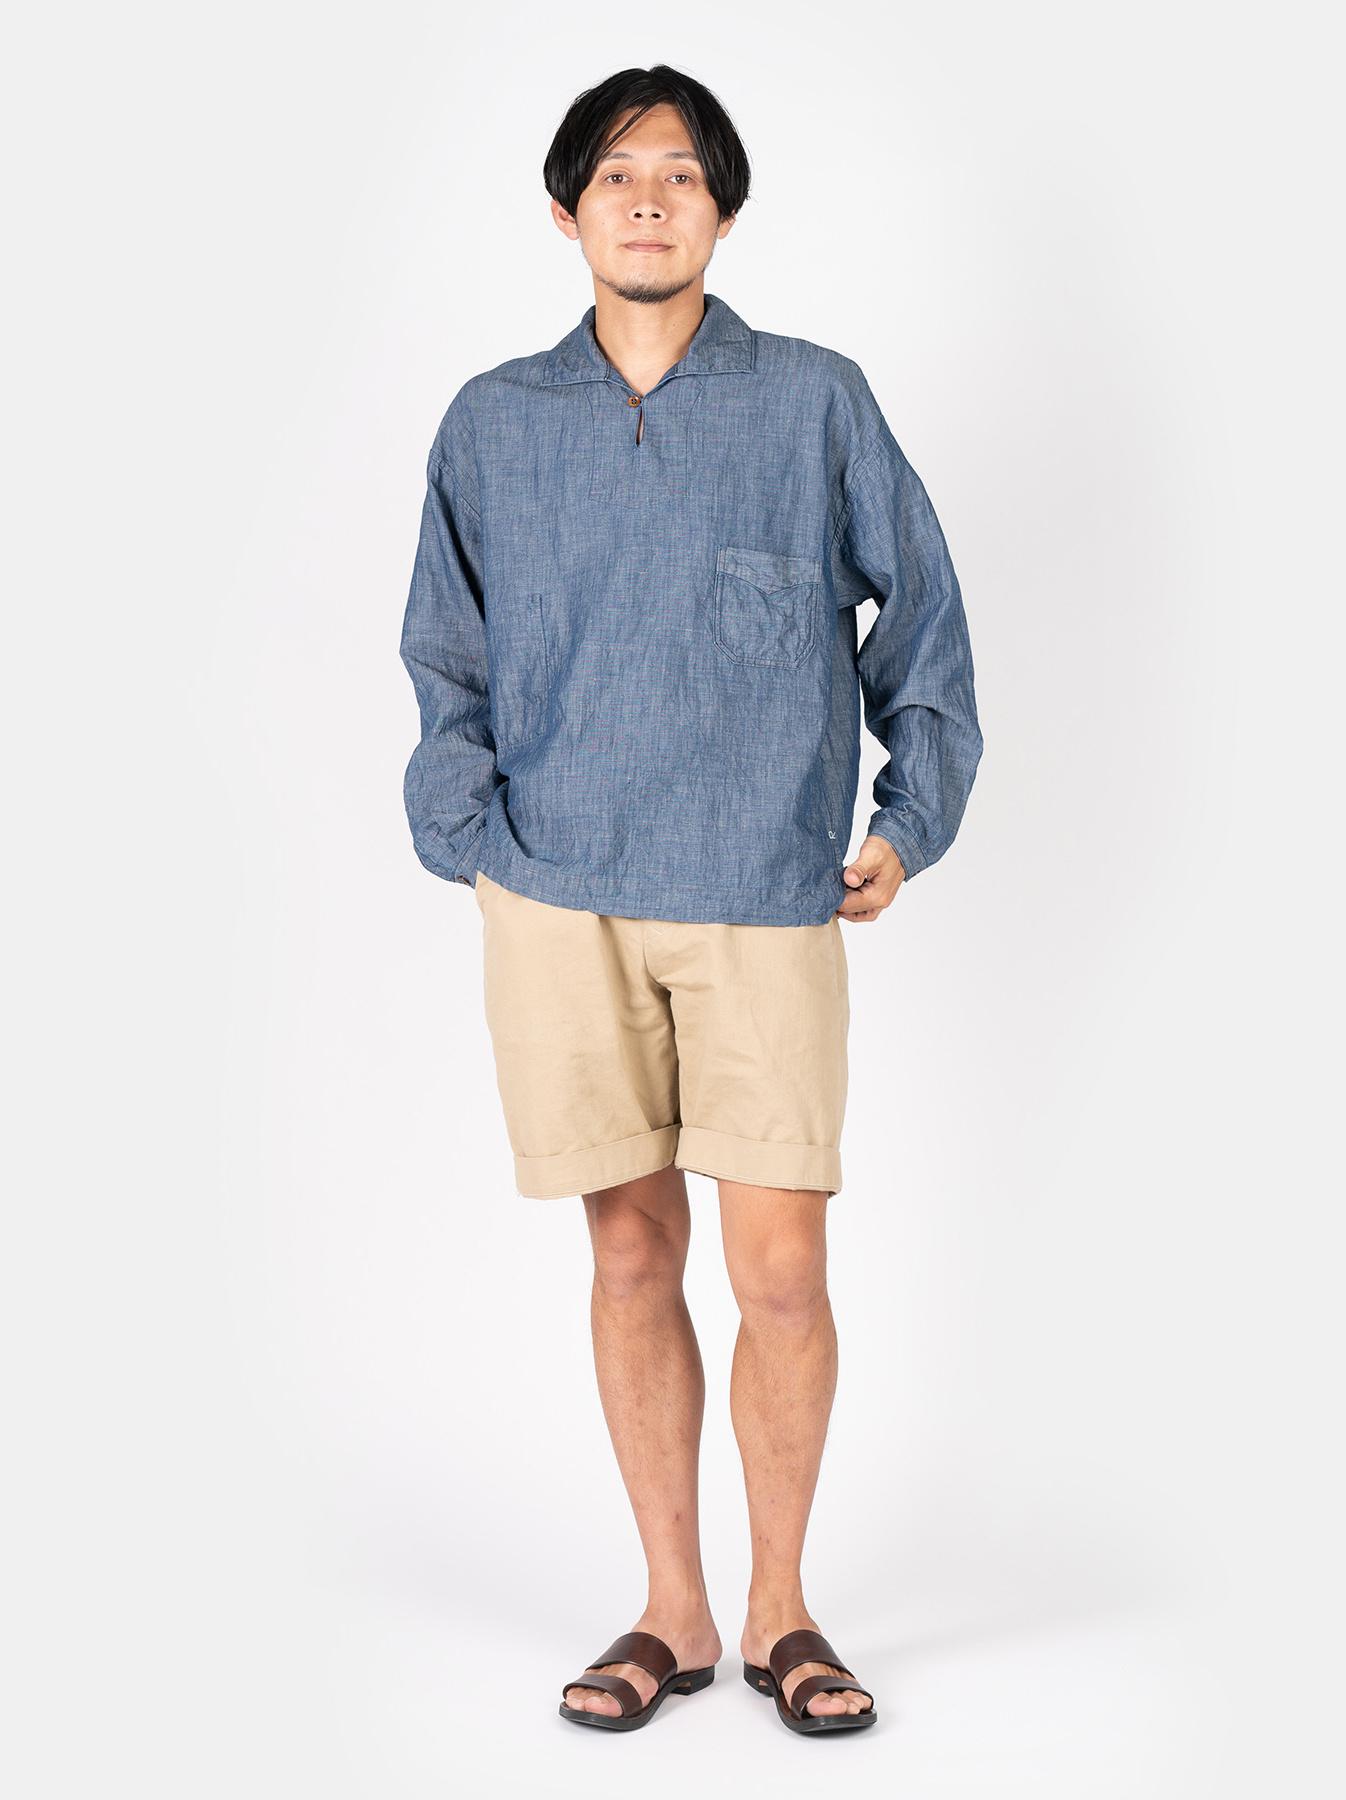 WH Cotton Linen Umahiko Pullover Shirt-2